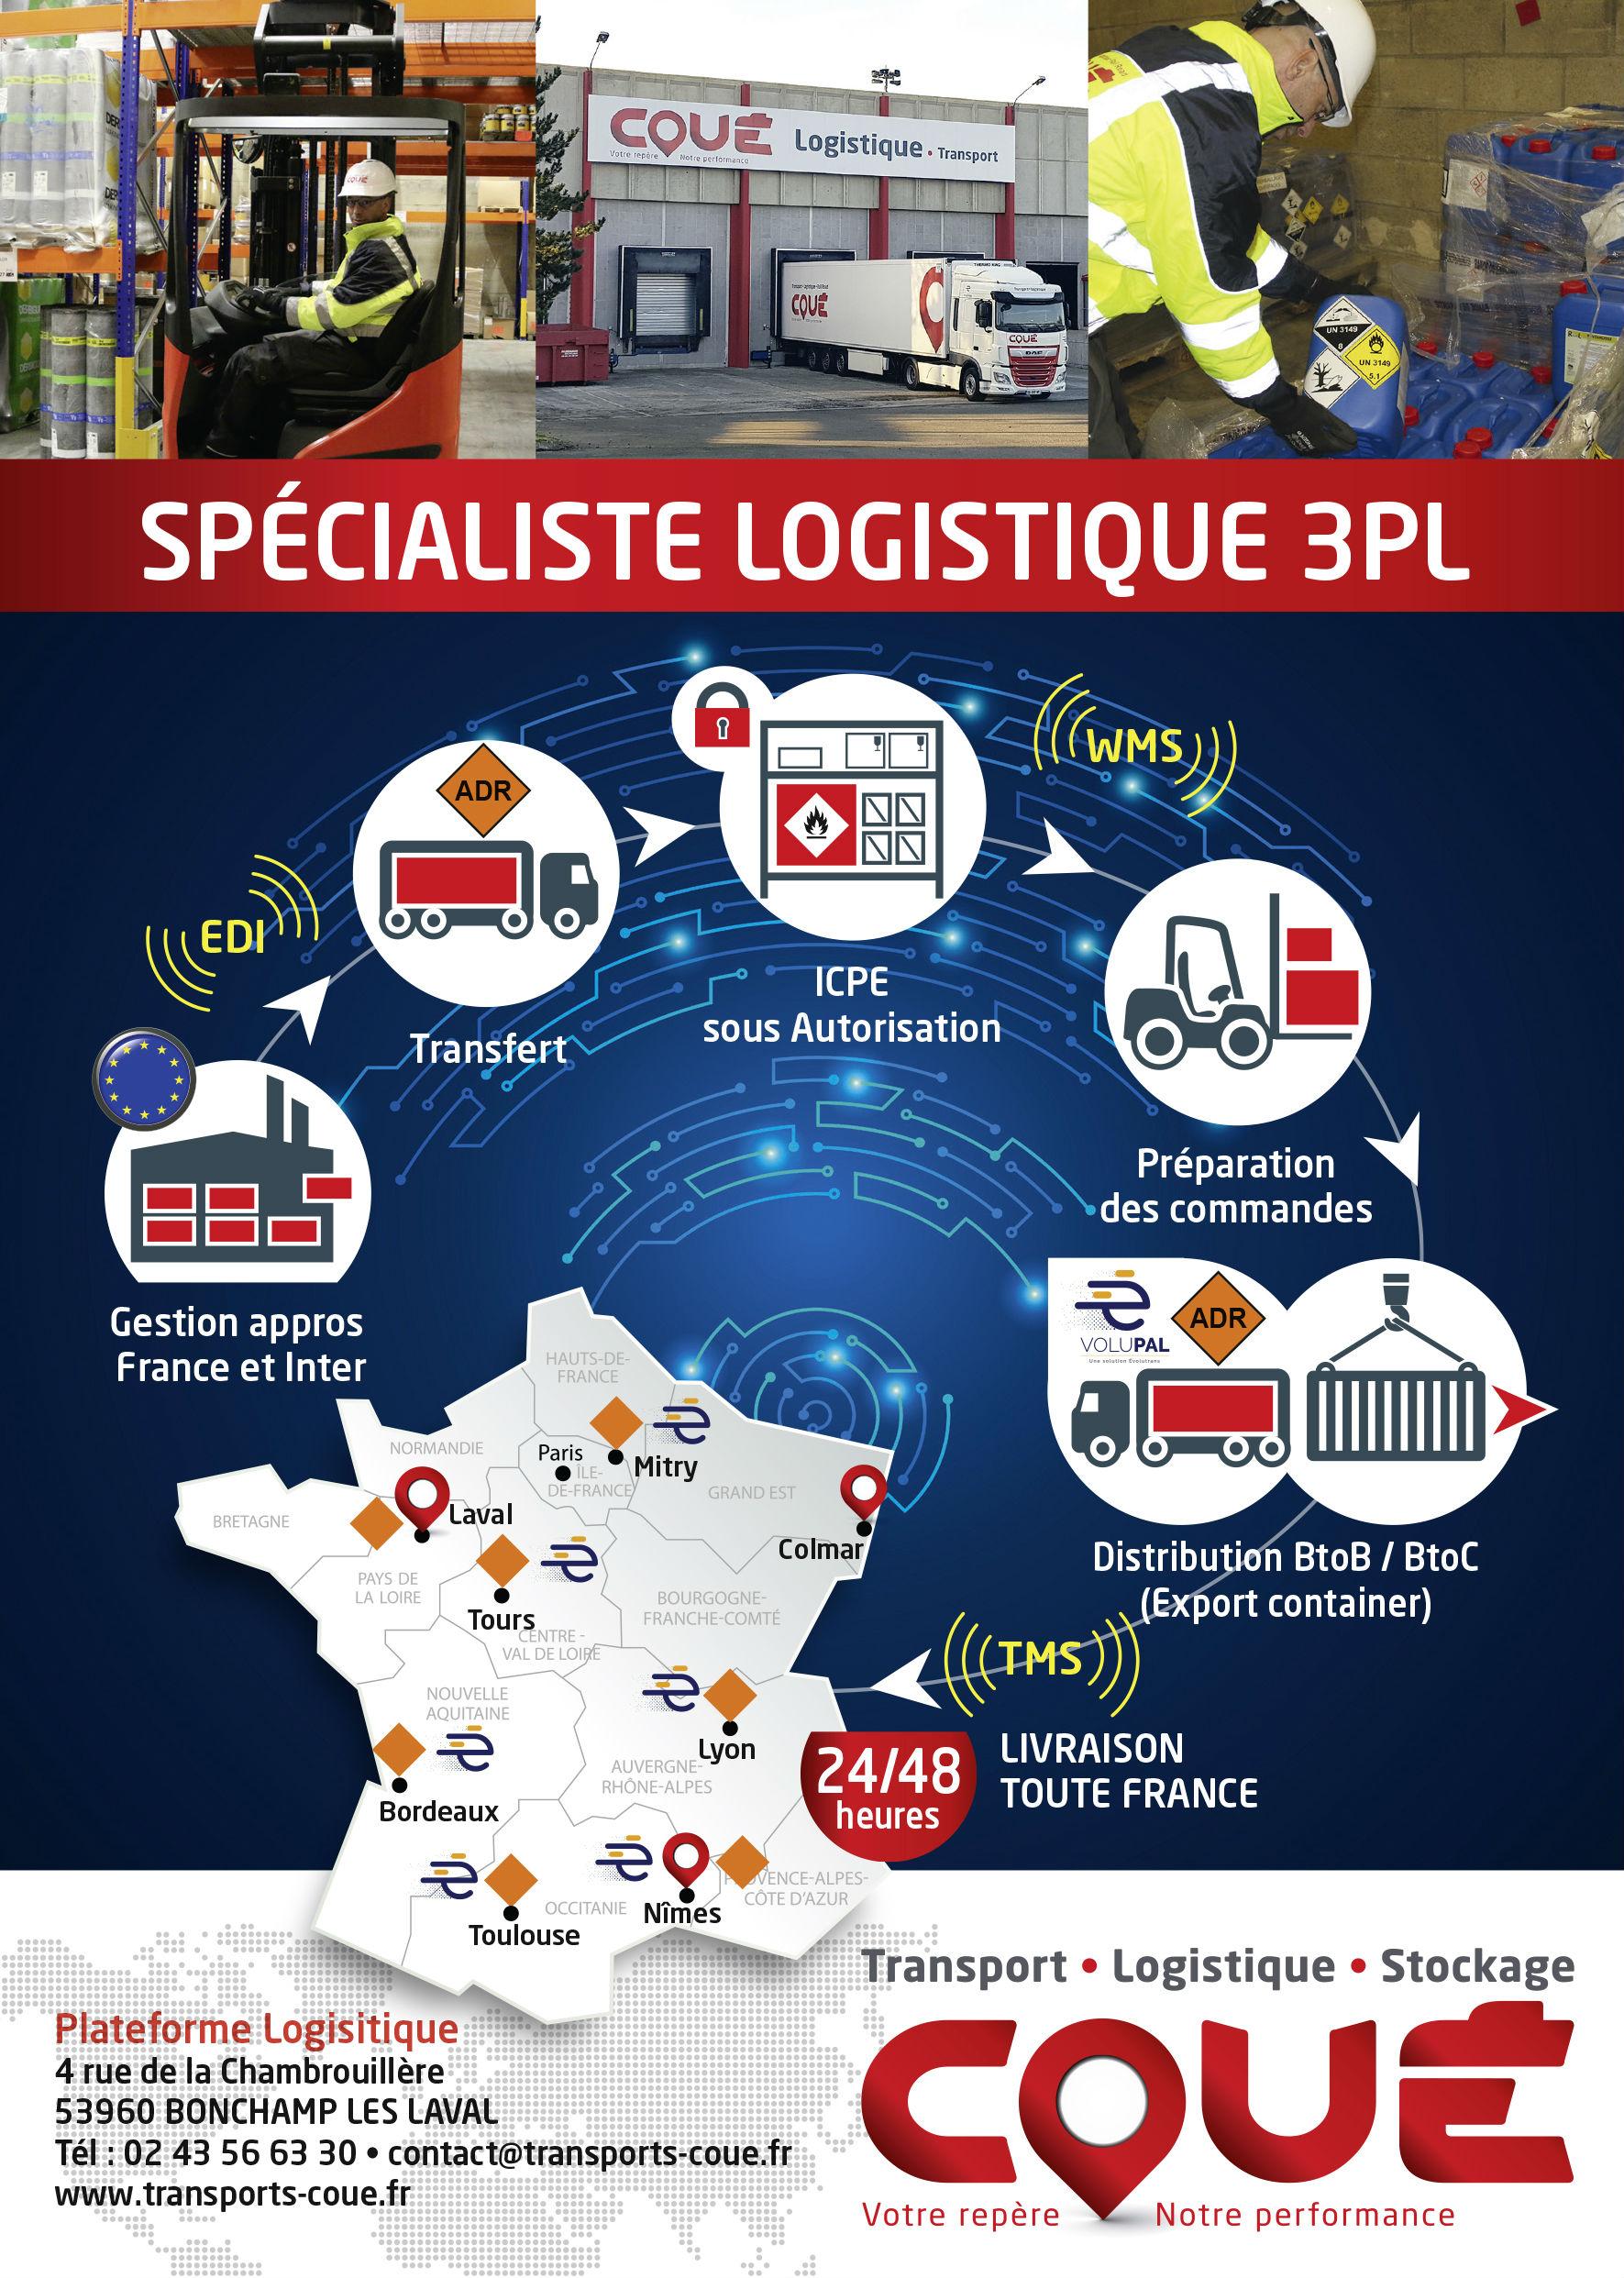 Transports Coue logistique stockage 3PL schema